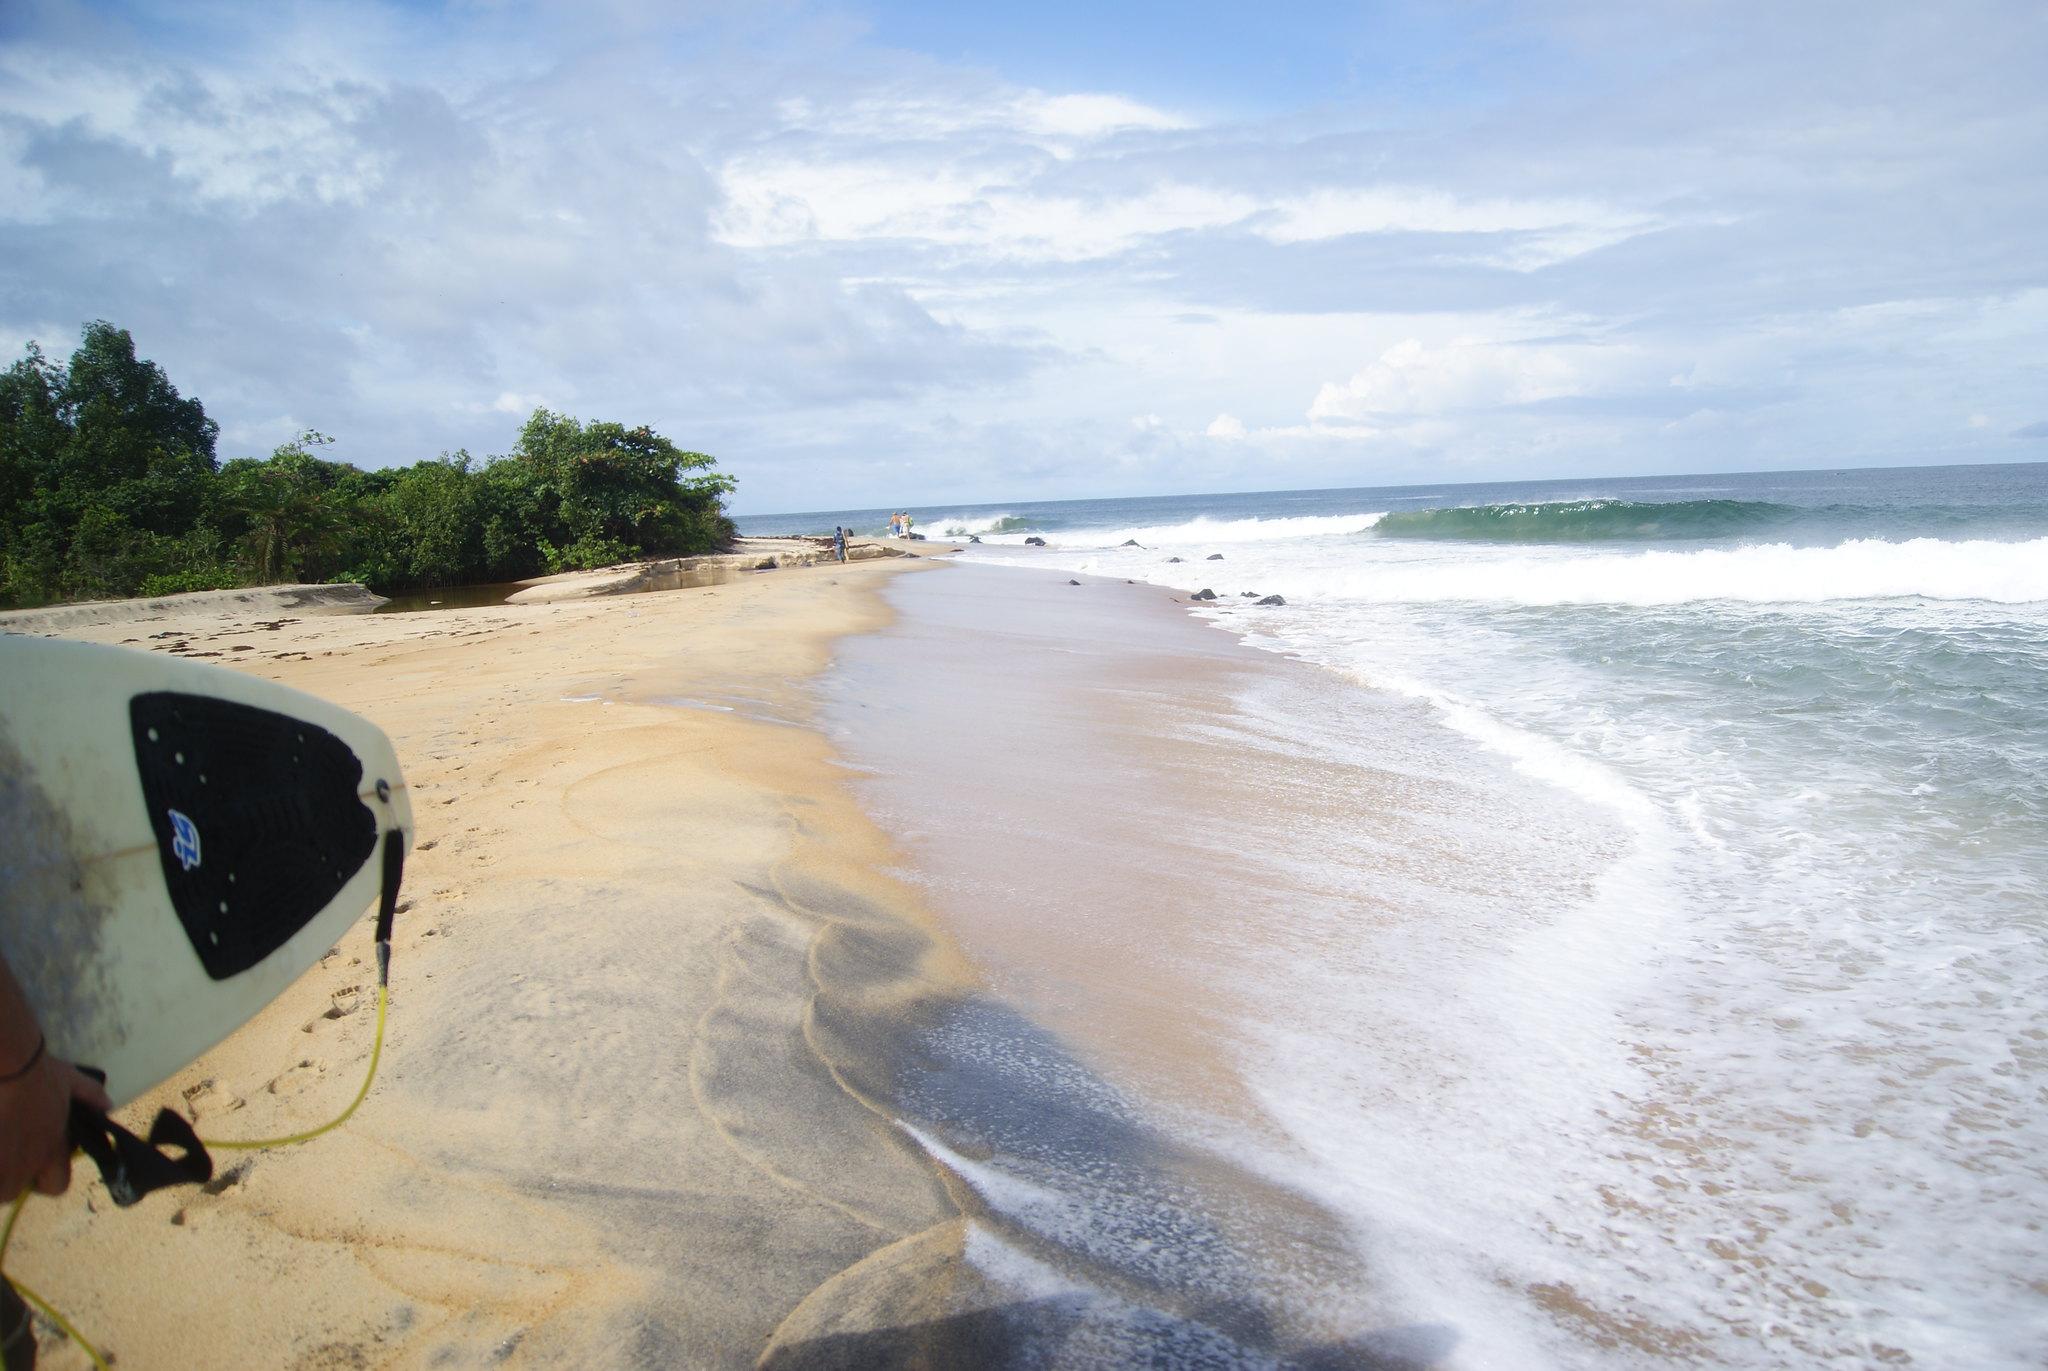 robertsport liberia surf